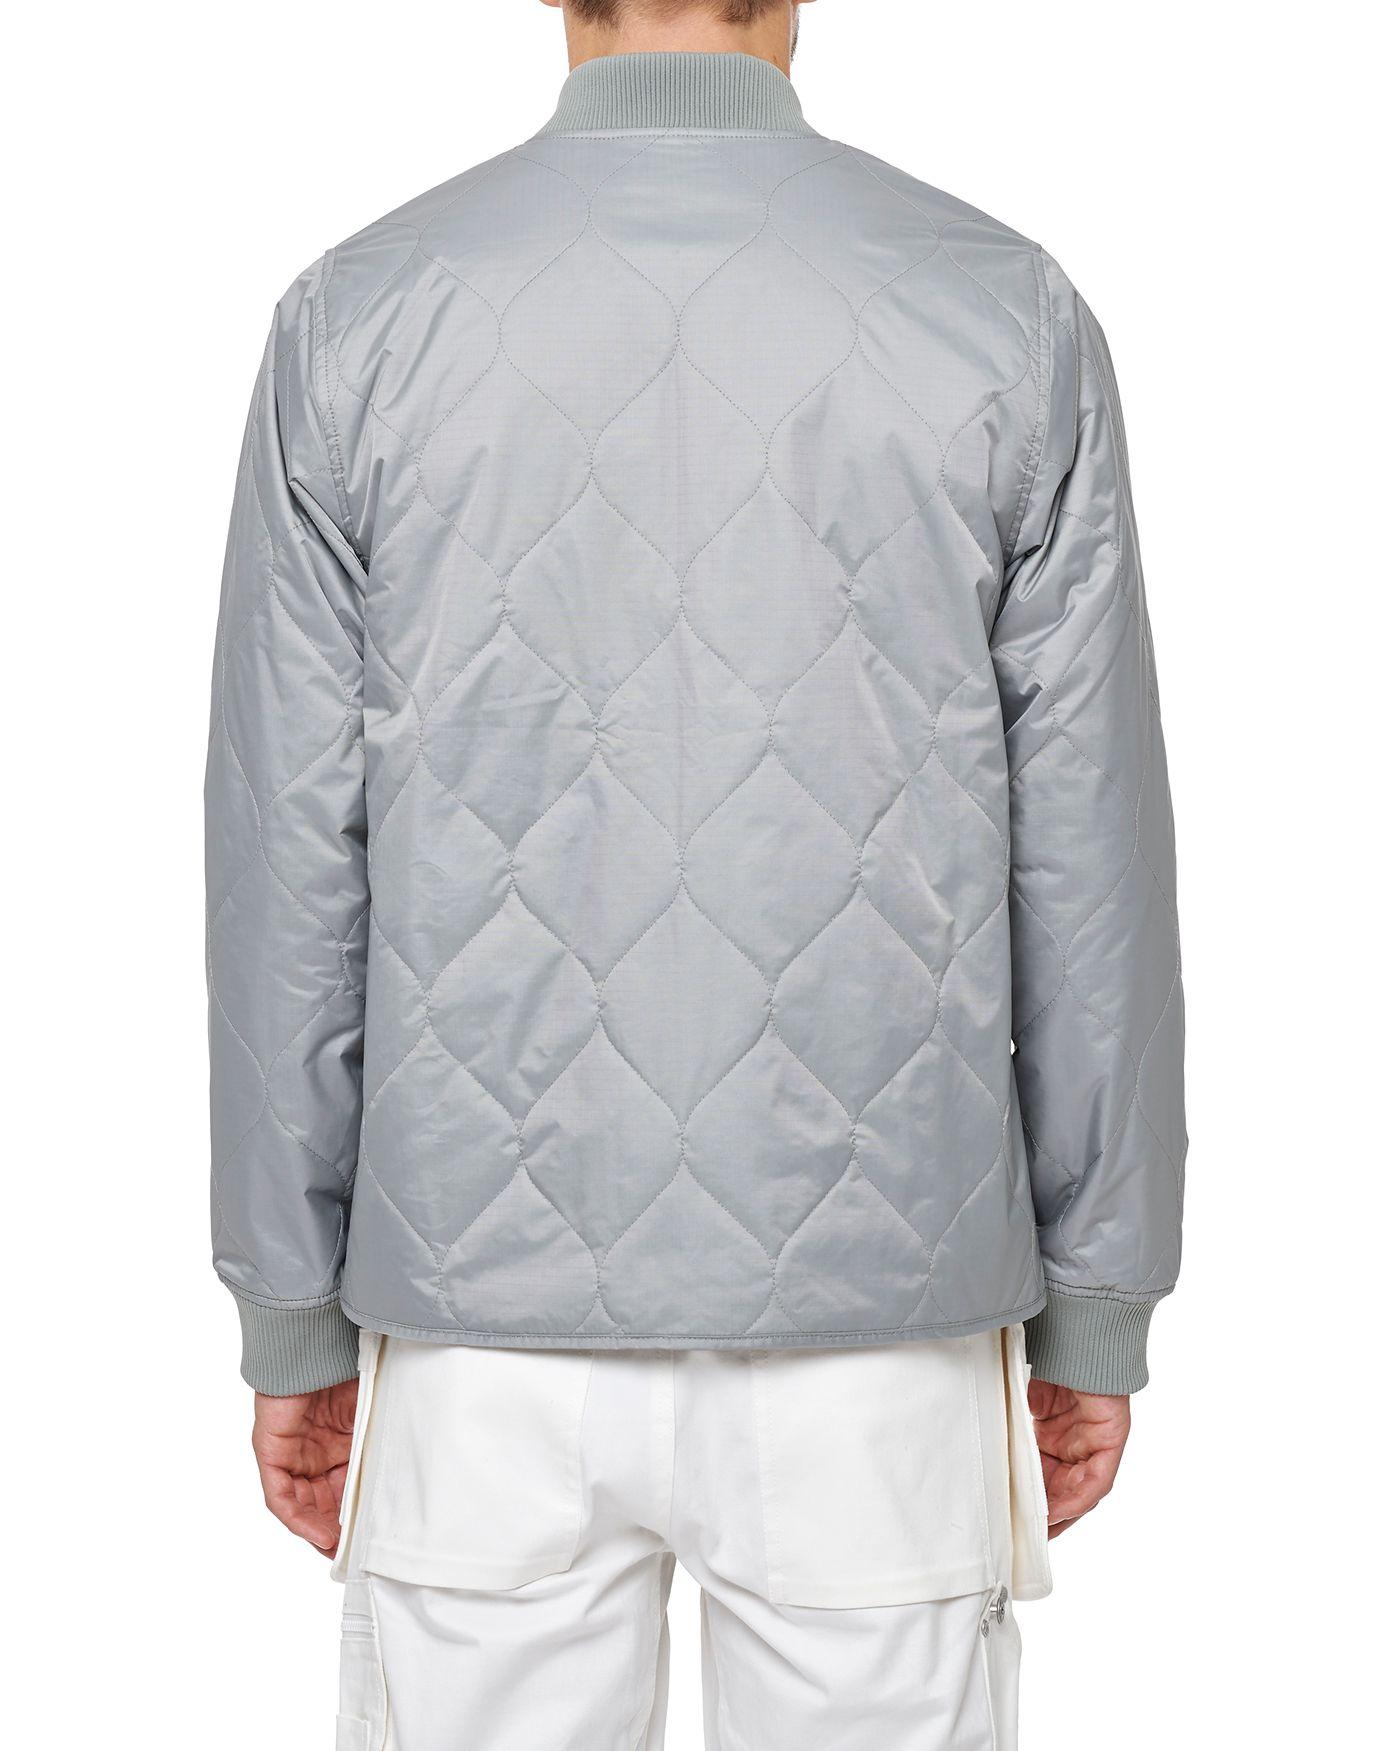 Photo of Alcro Insulator Jacket Insulator Jacket, Limestone